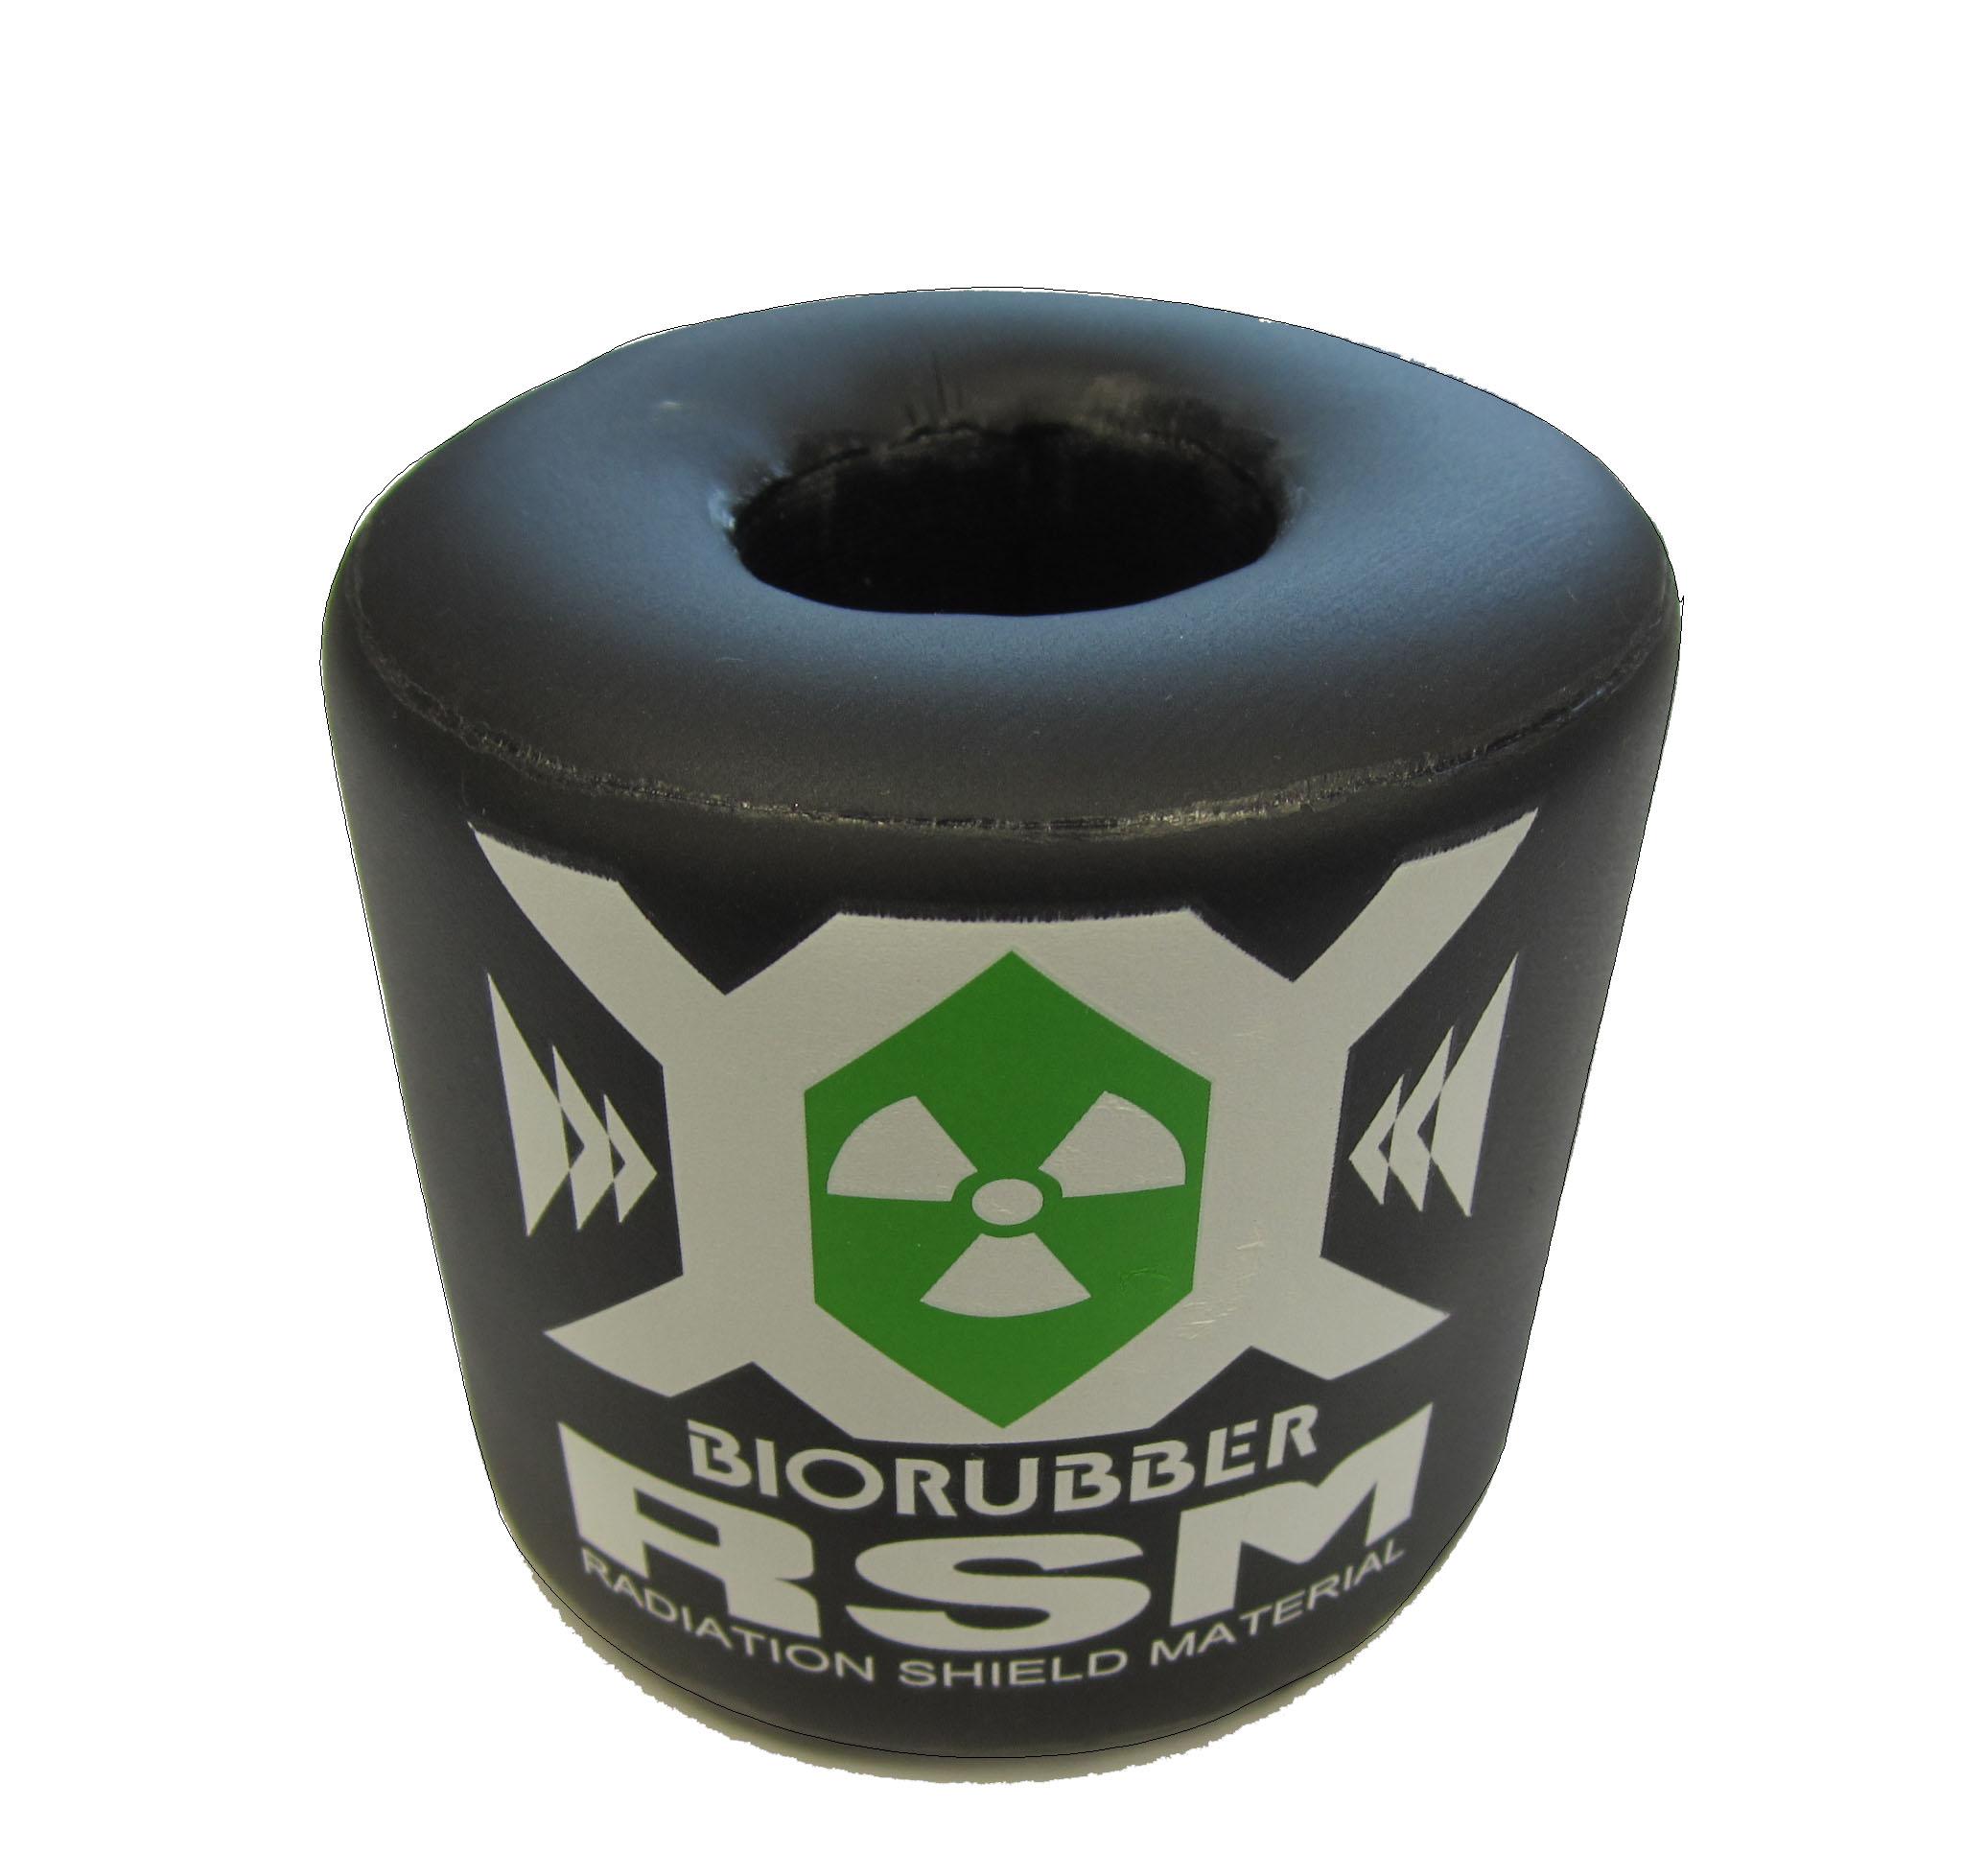 biorubber1.jpg